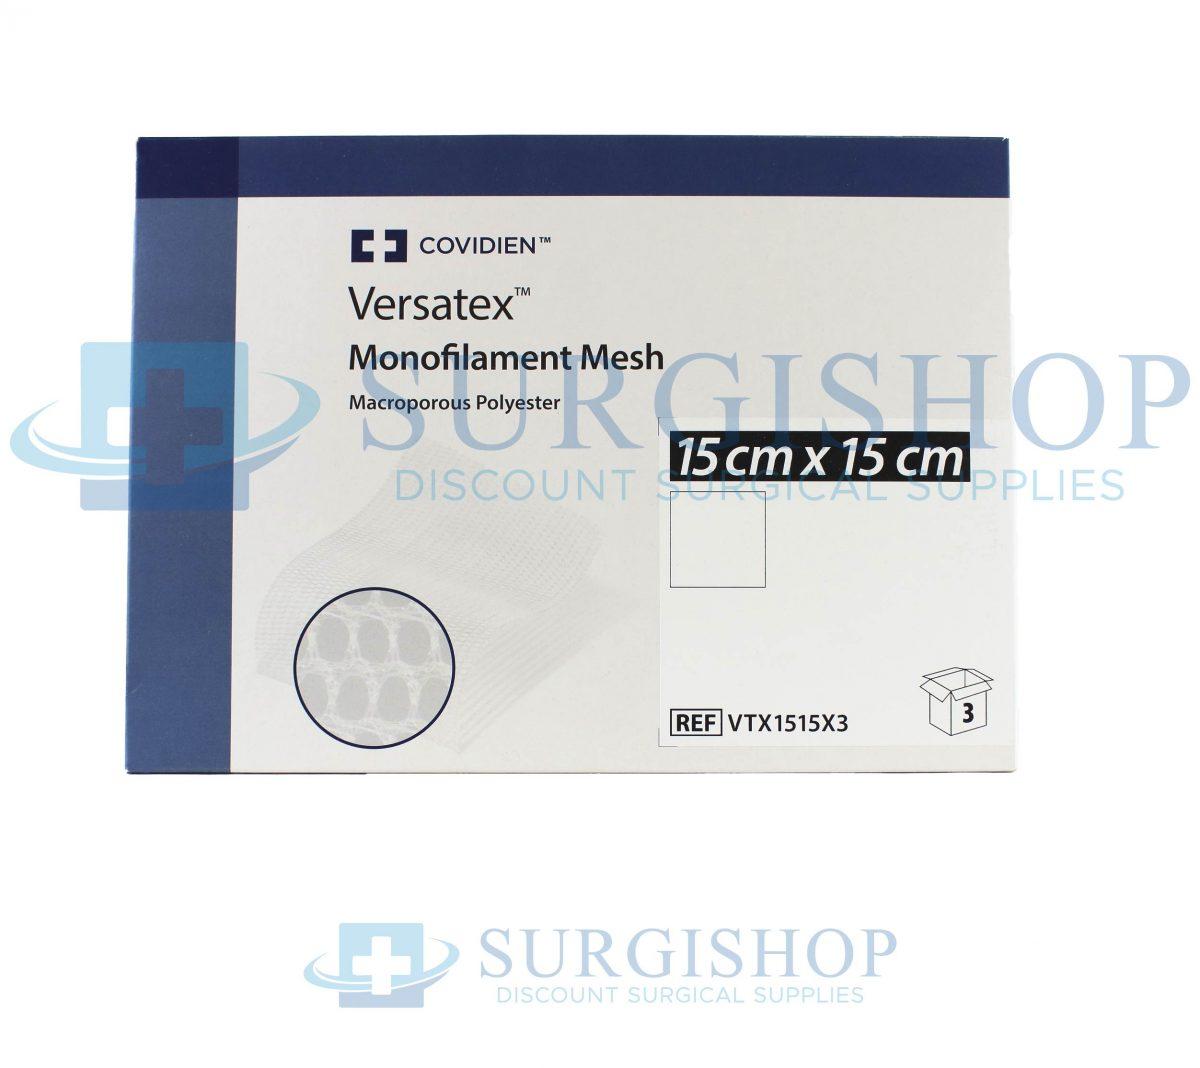 Covidien Versatex Monofilament Mesh 15cm X 15cm